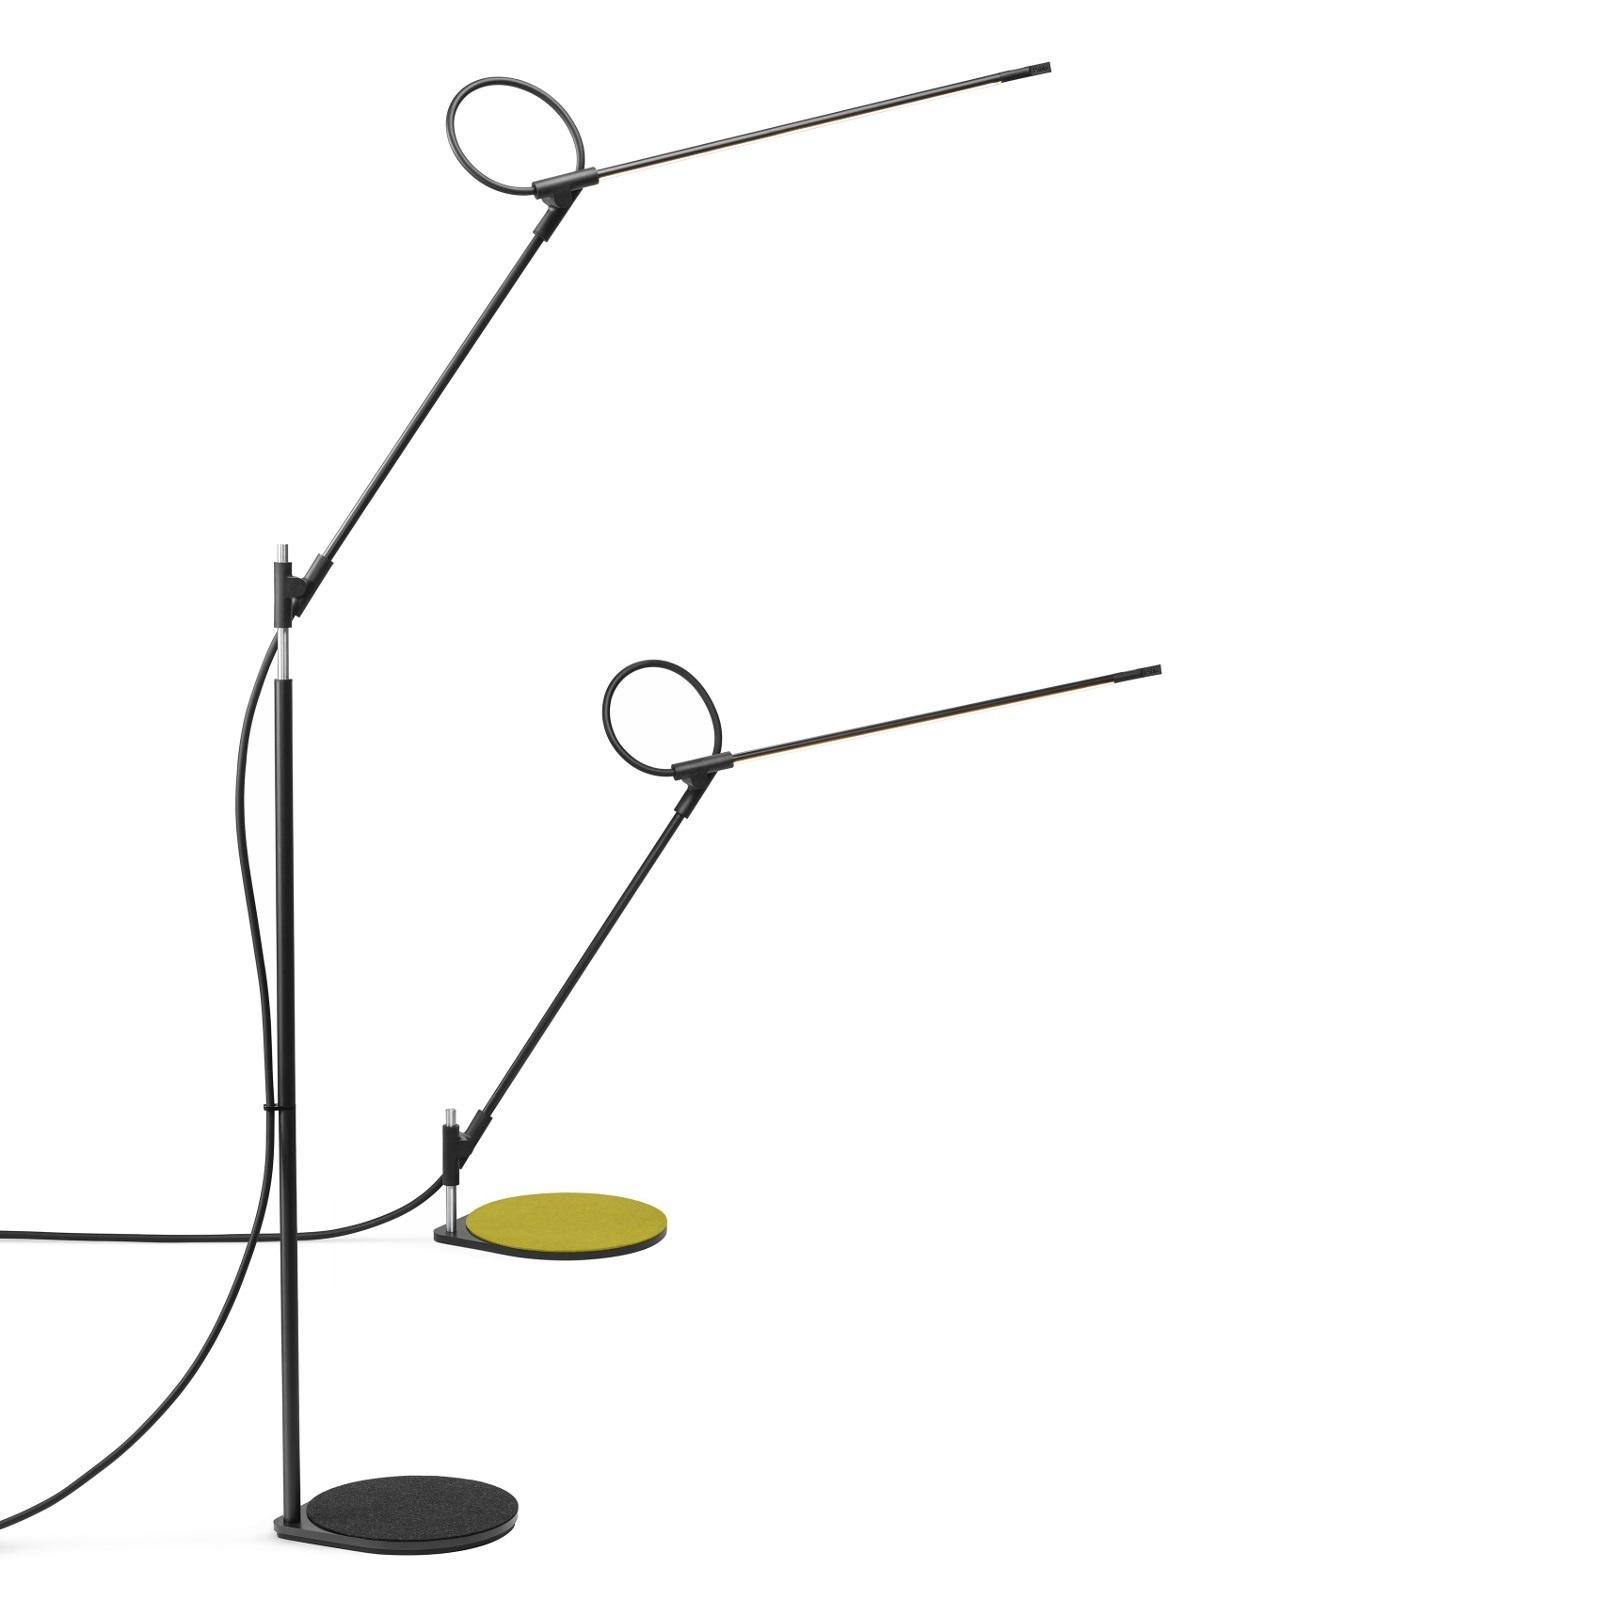 Pablo Designs Superlight Led Floor Lamp Black